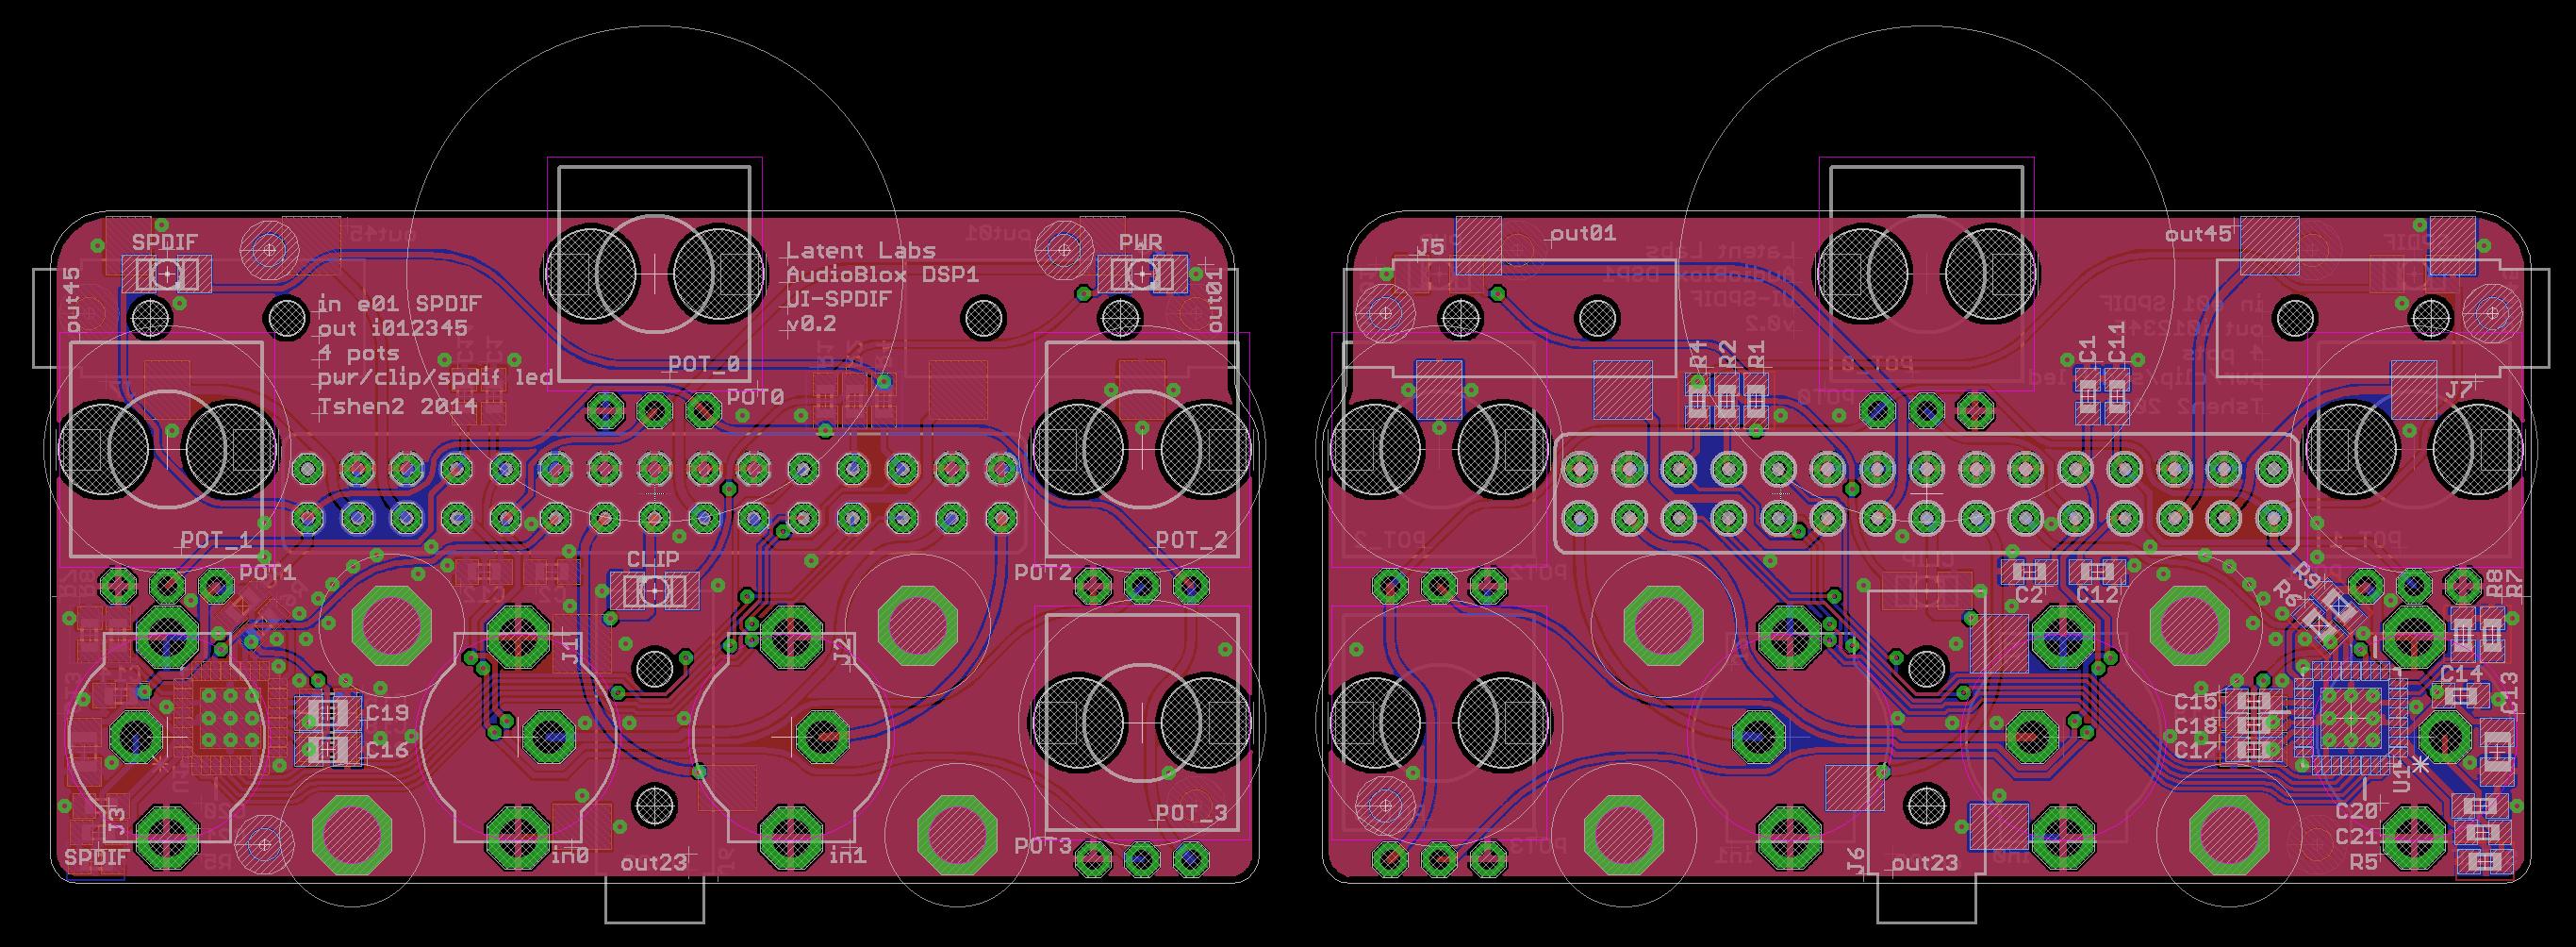 DSP 01: hi-fi audio signal processor | Hackaday io